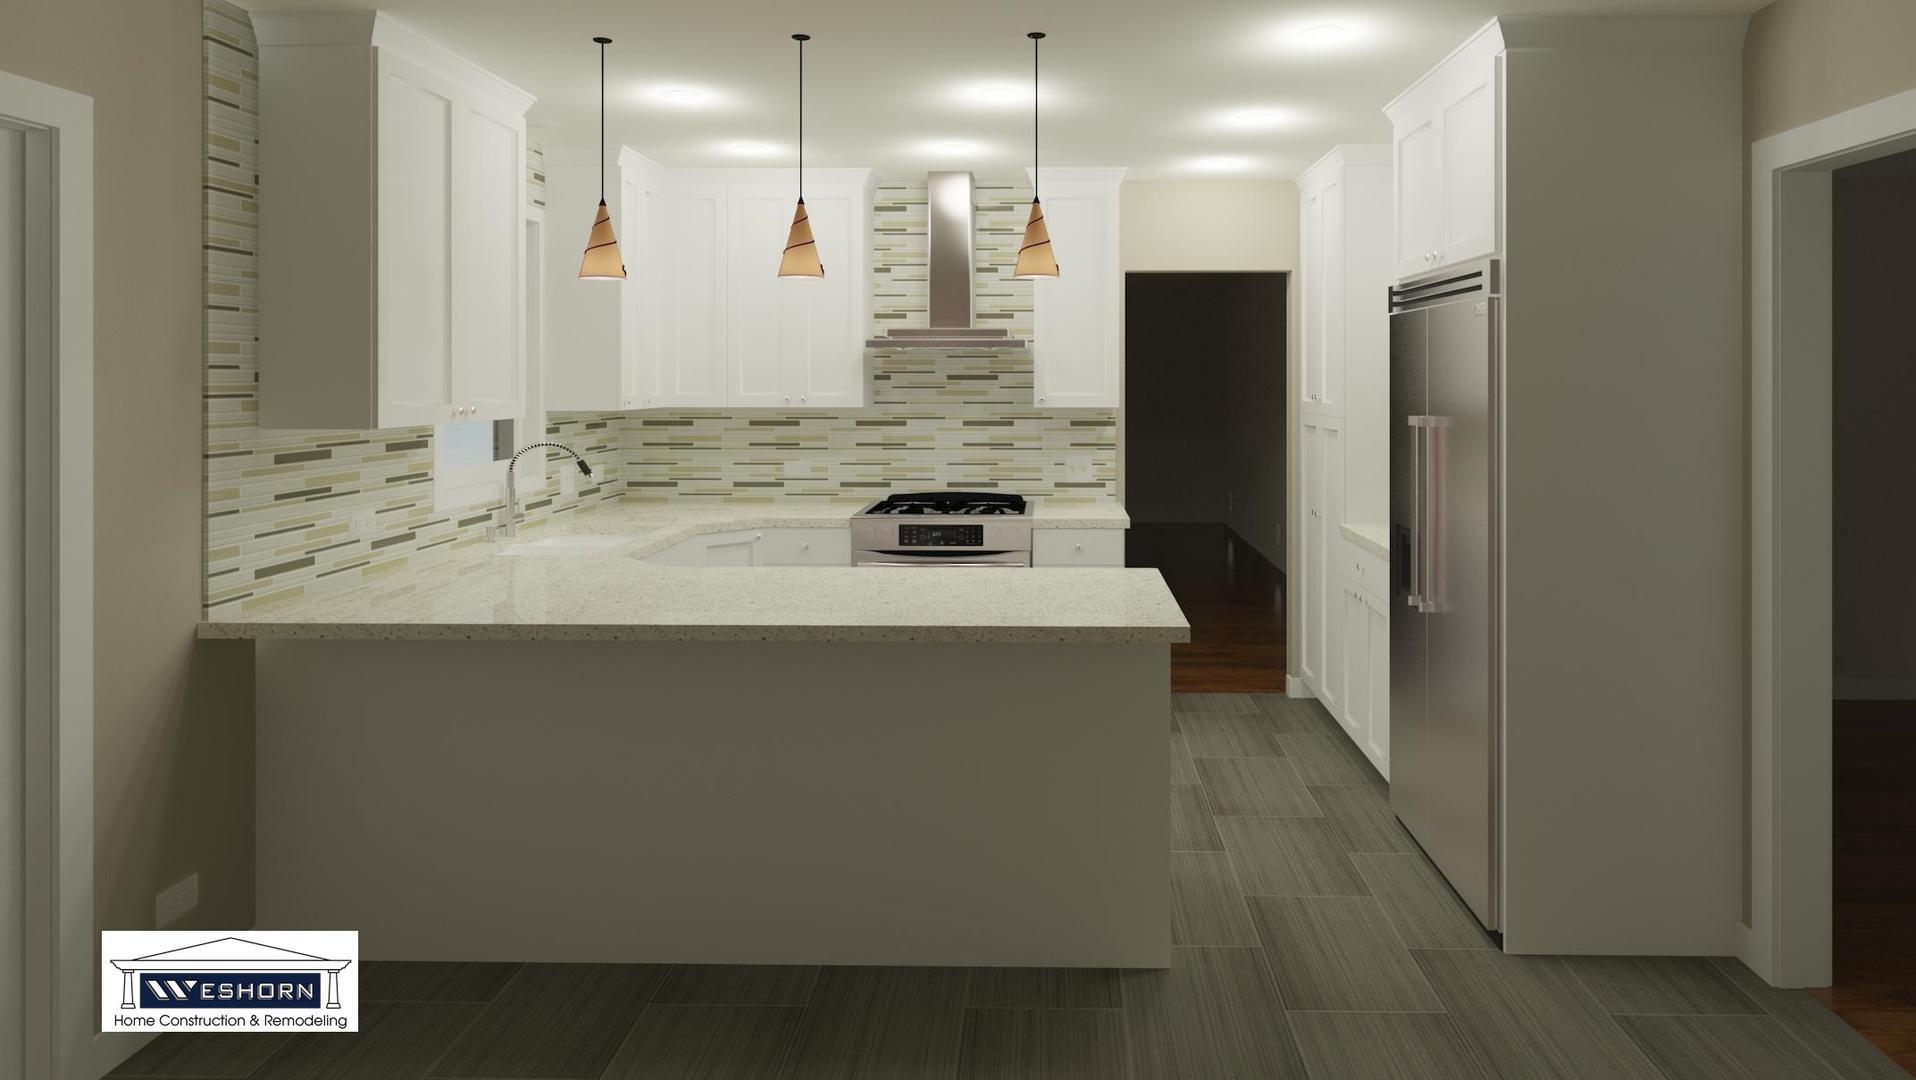 Design Examples Kitchen Bath Basement Remodeling Finishing